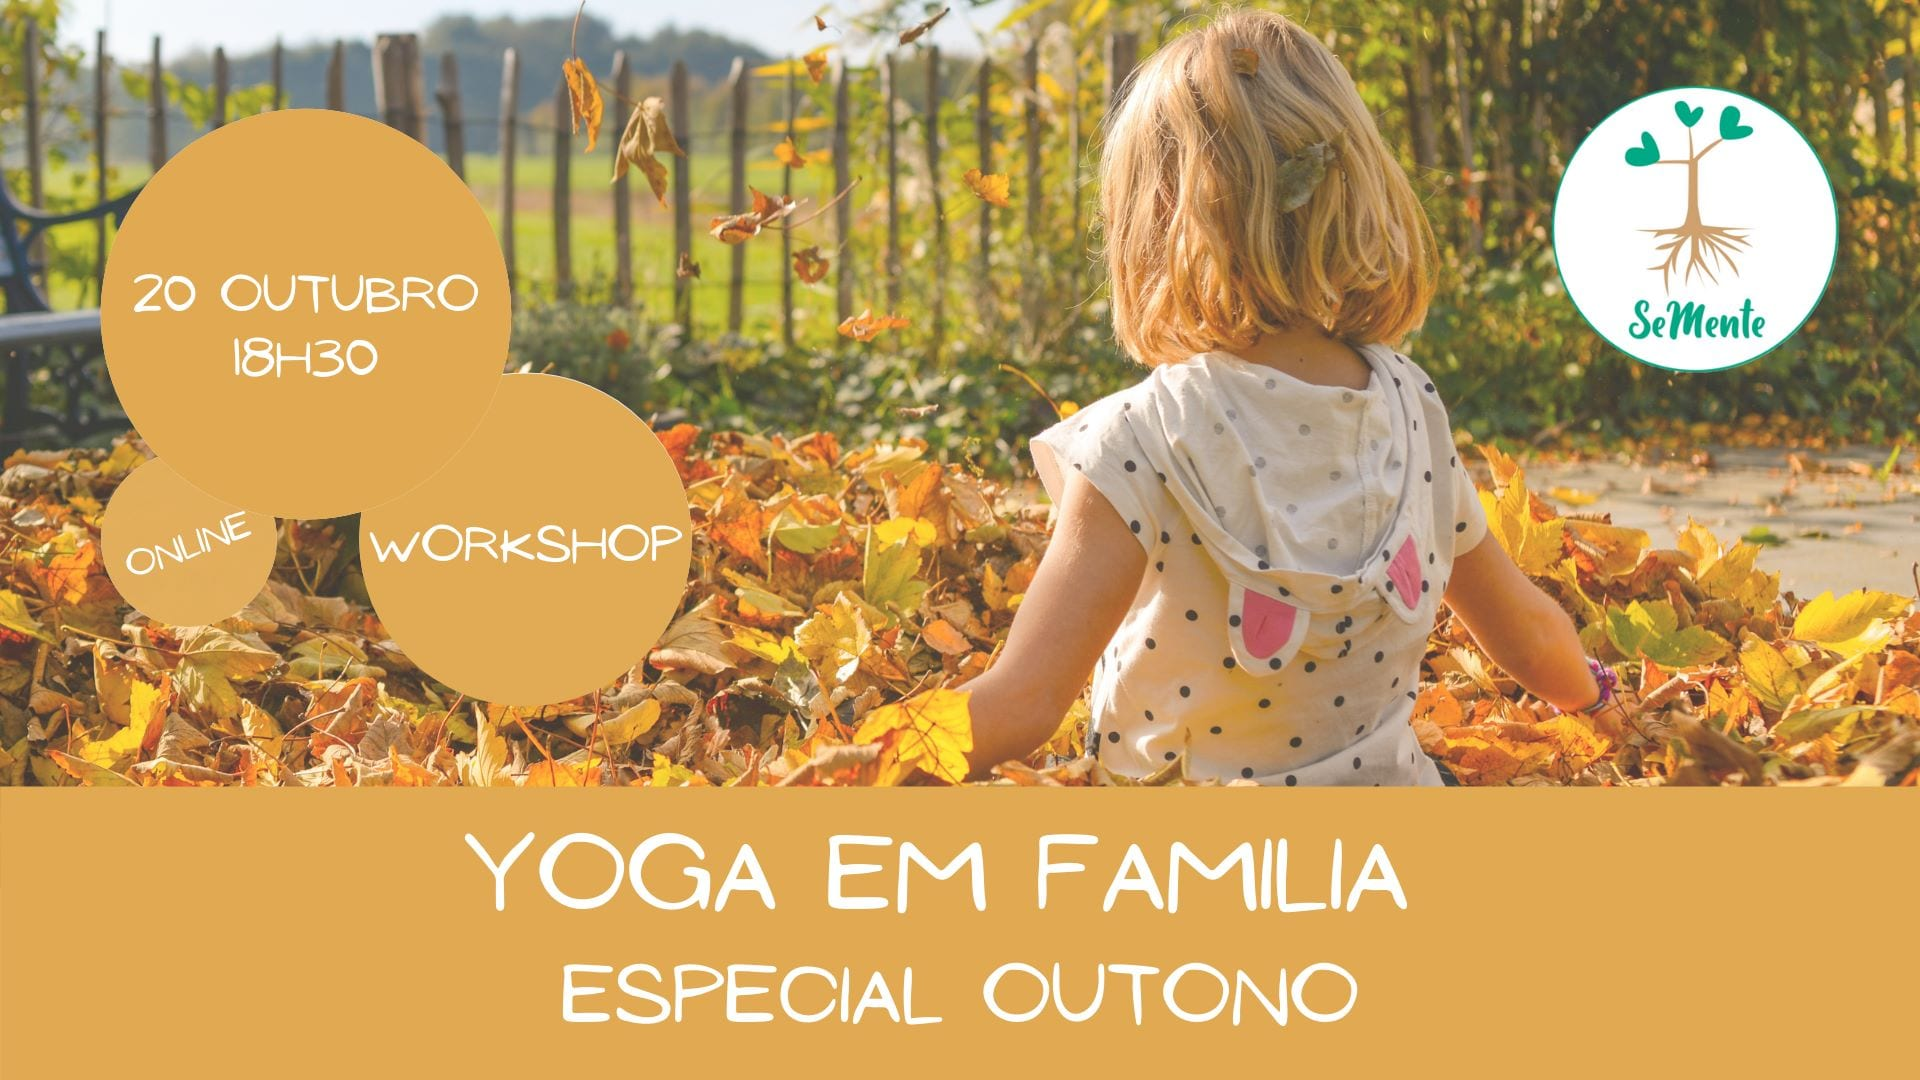 Semente - Yoga Outono